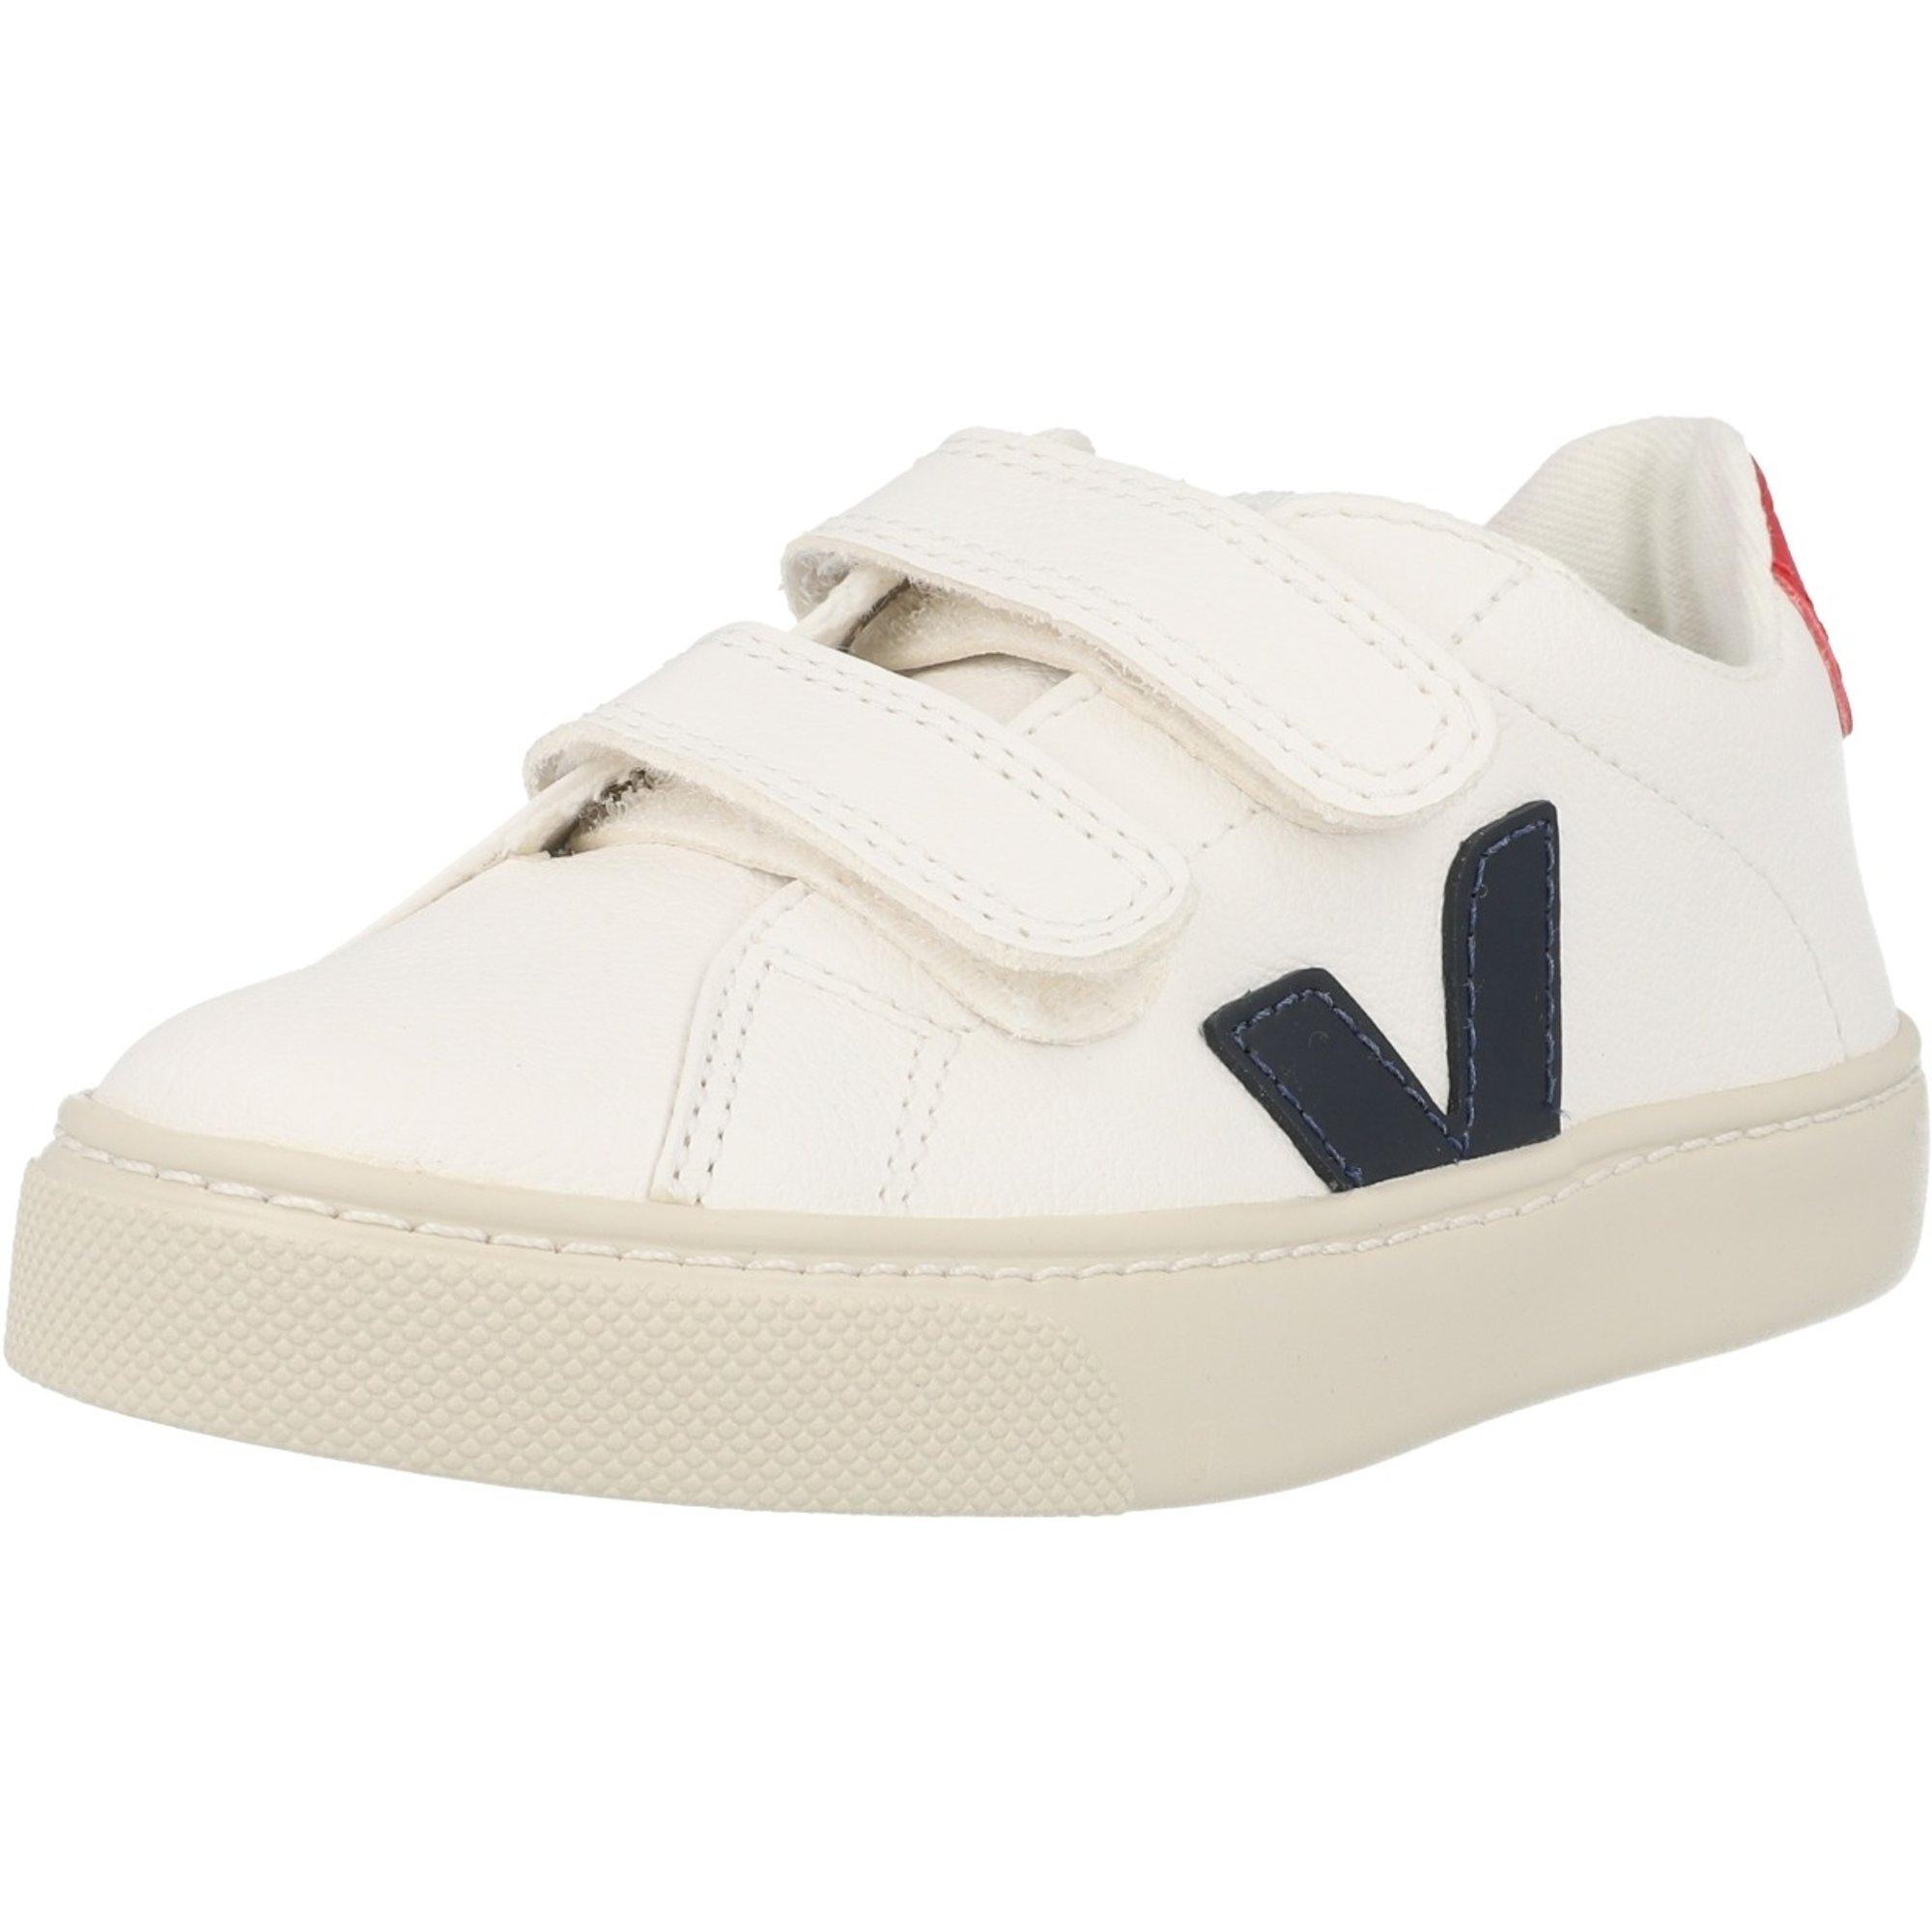 Veja Esplar Velcro Extra White/Nautico